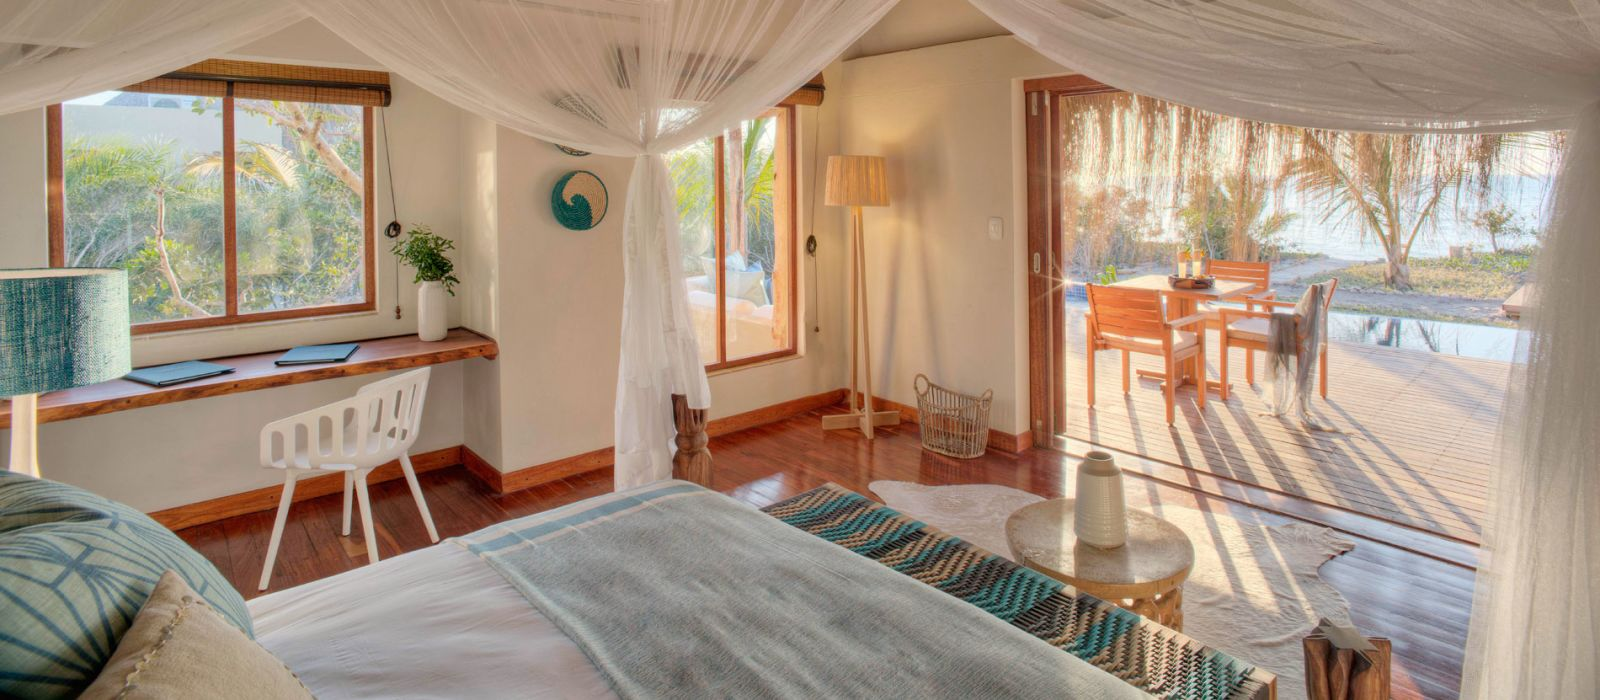 Hotel Azura Benguerra Lodge Mozambique